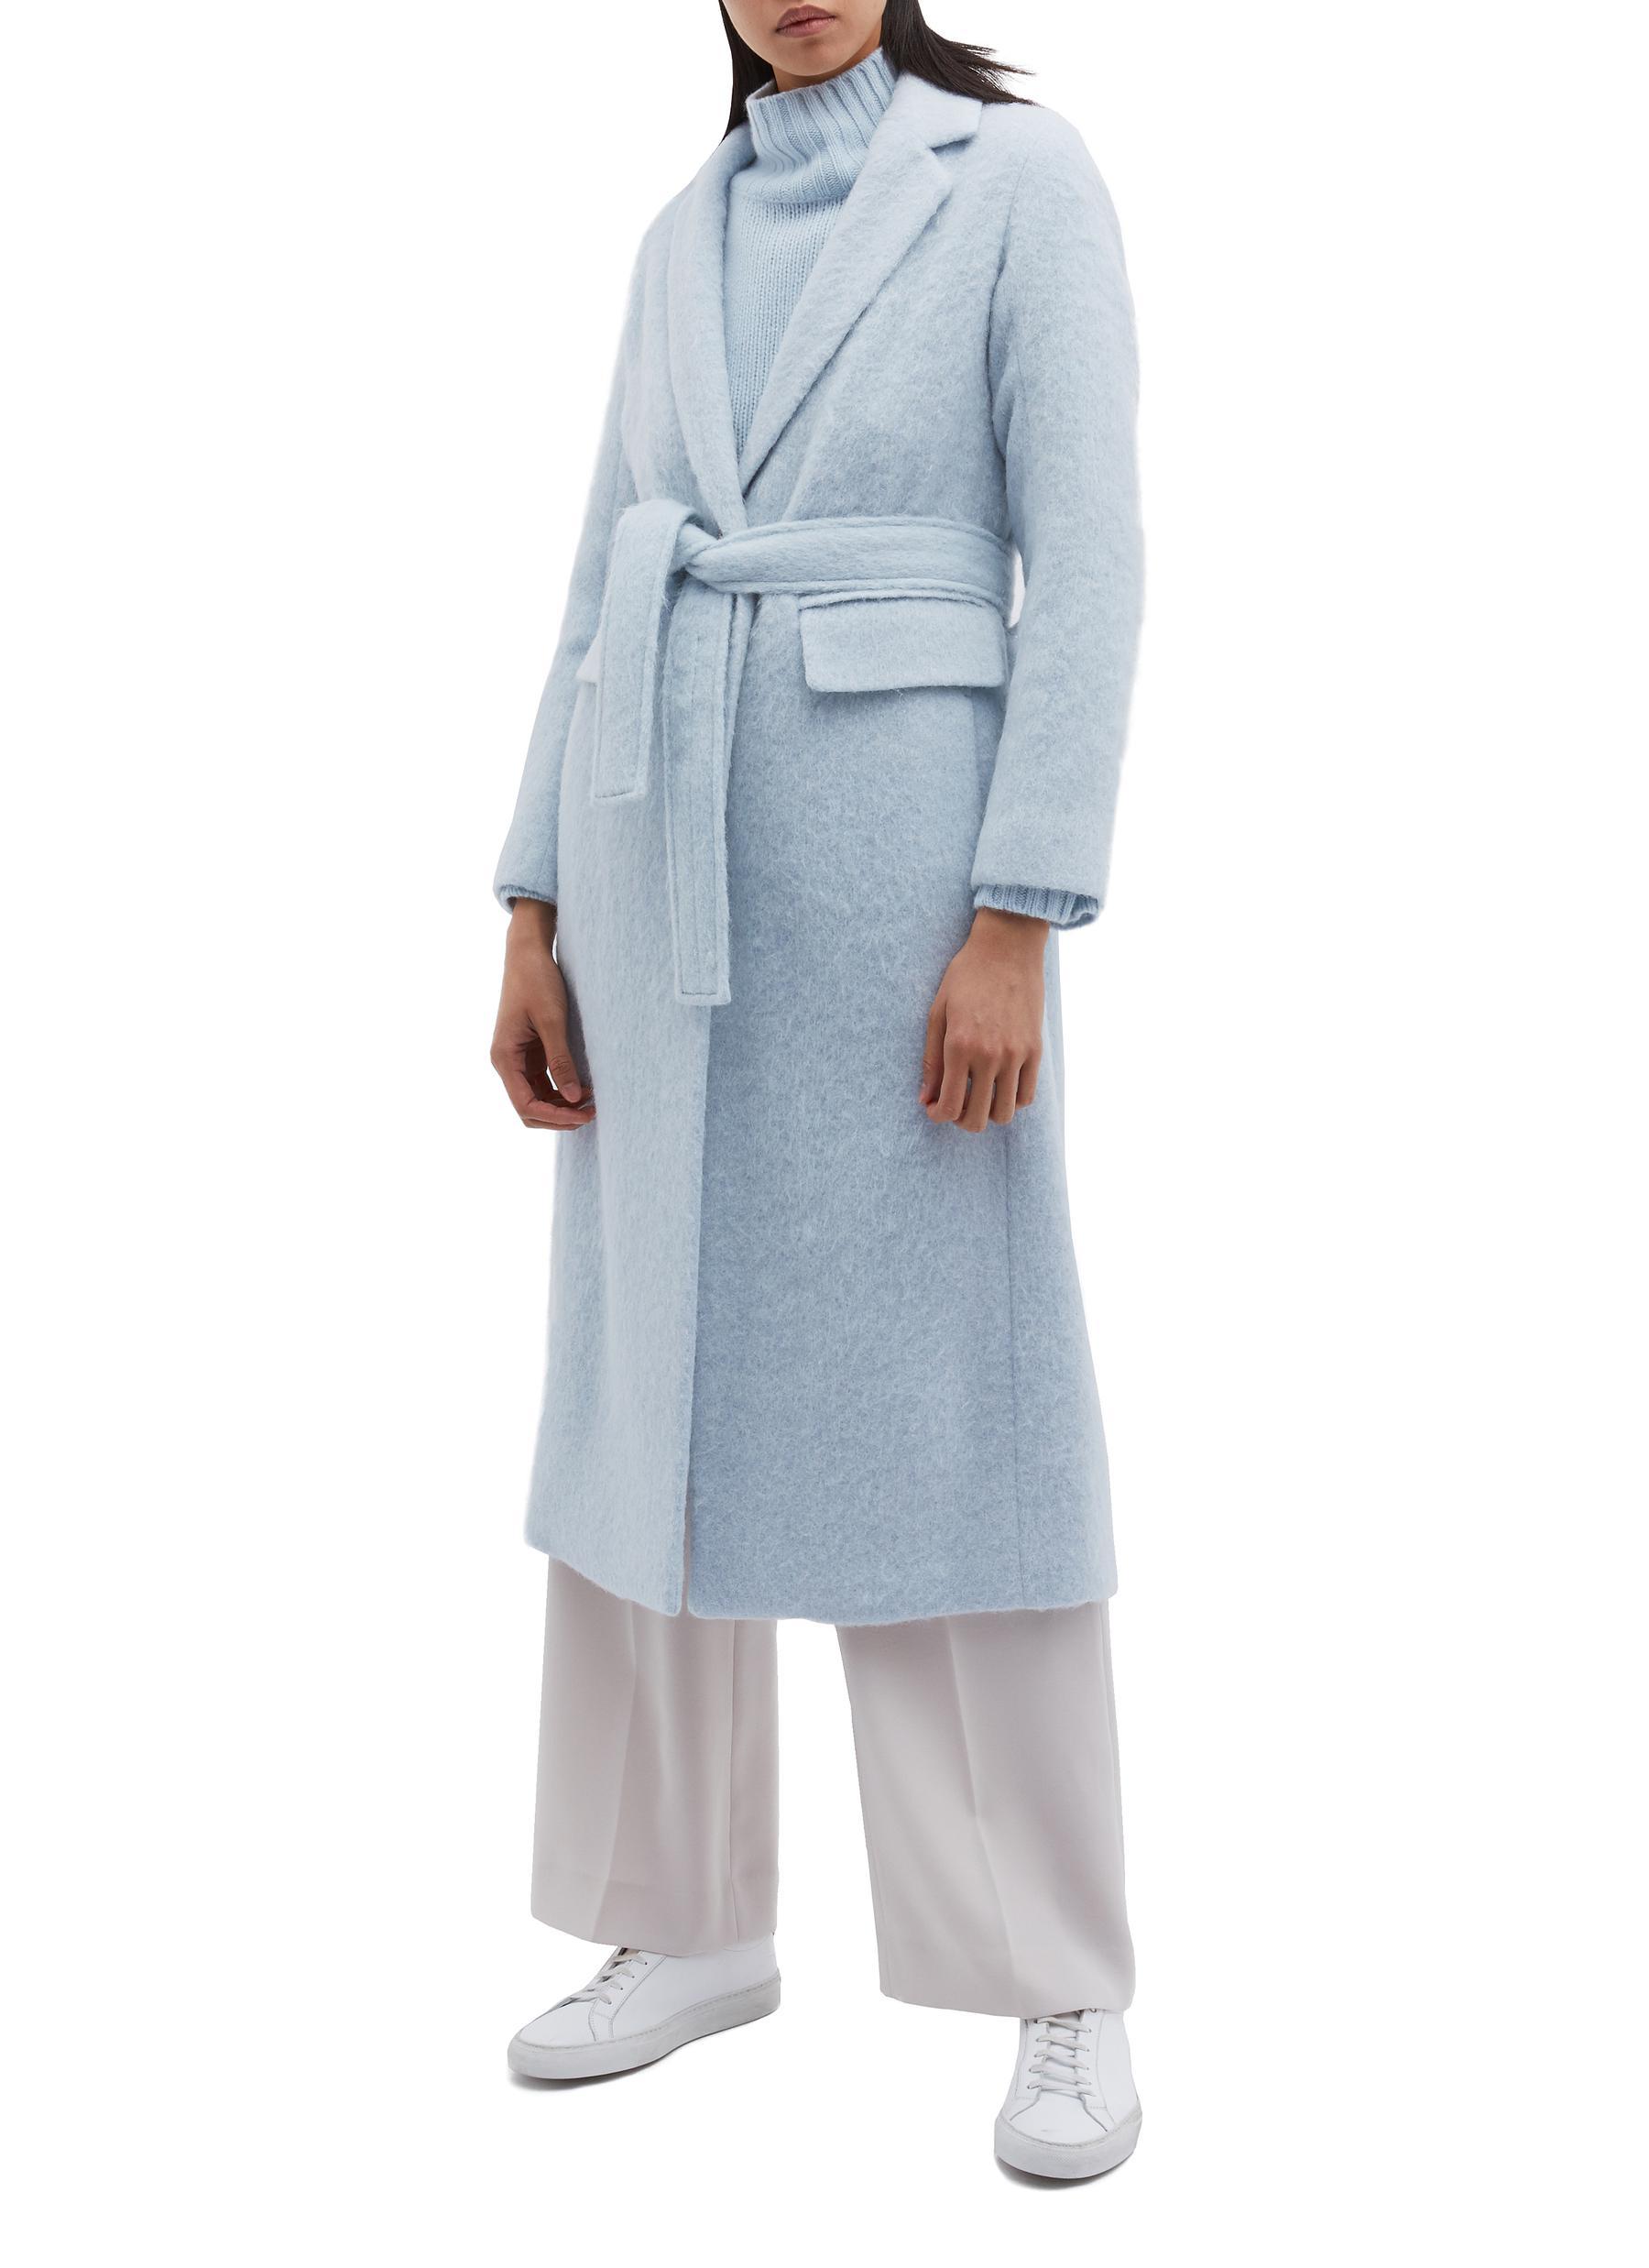 Belted brushed coat by Vince